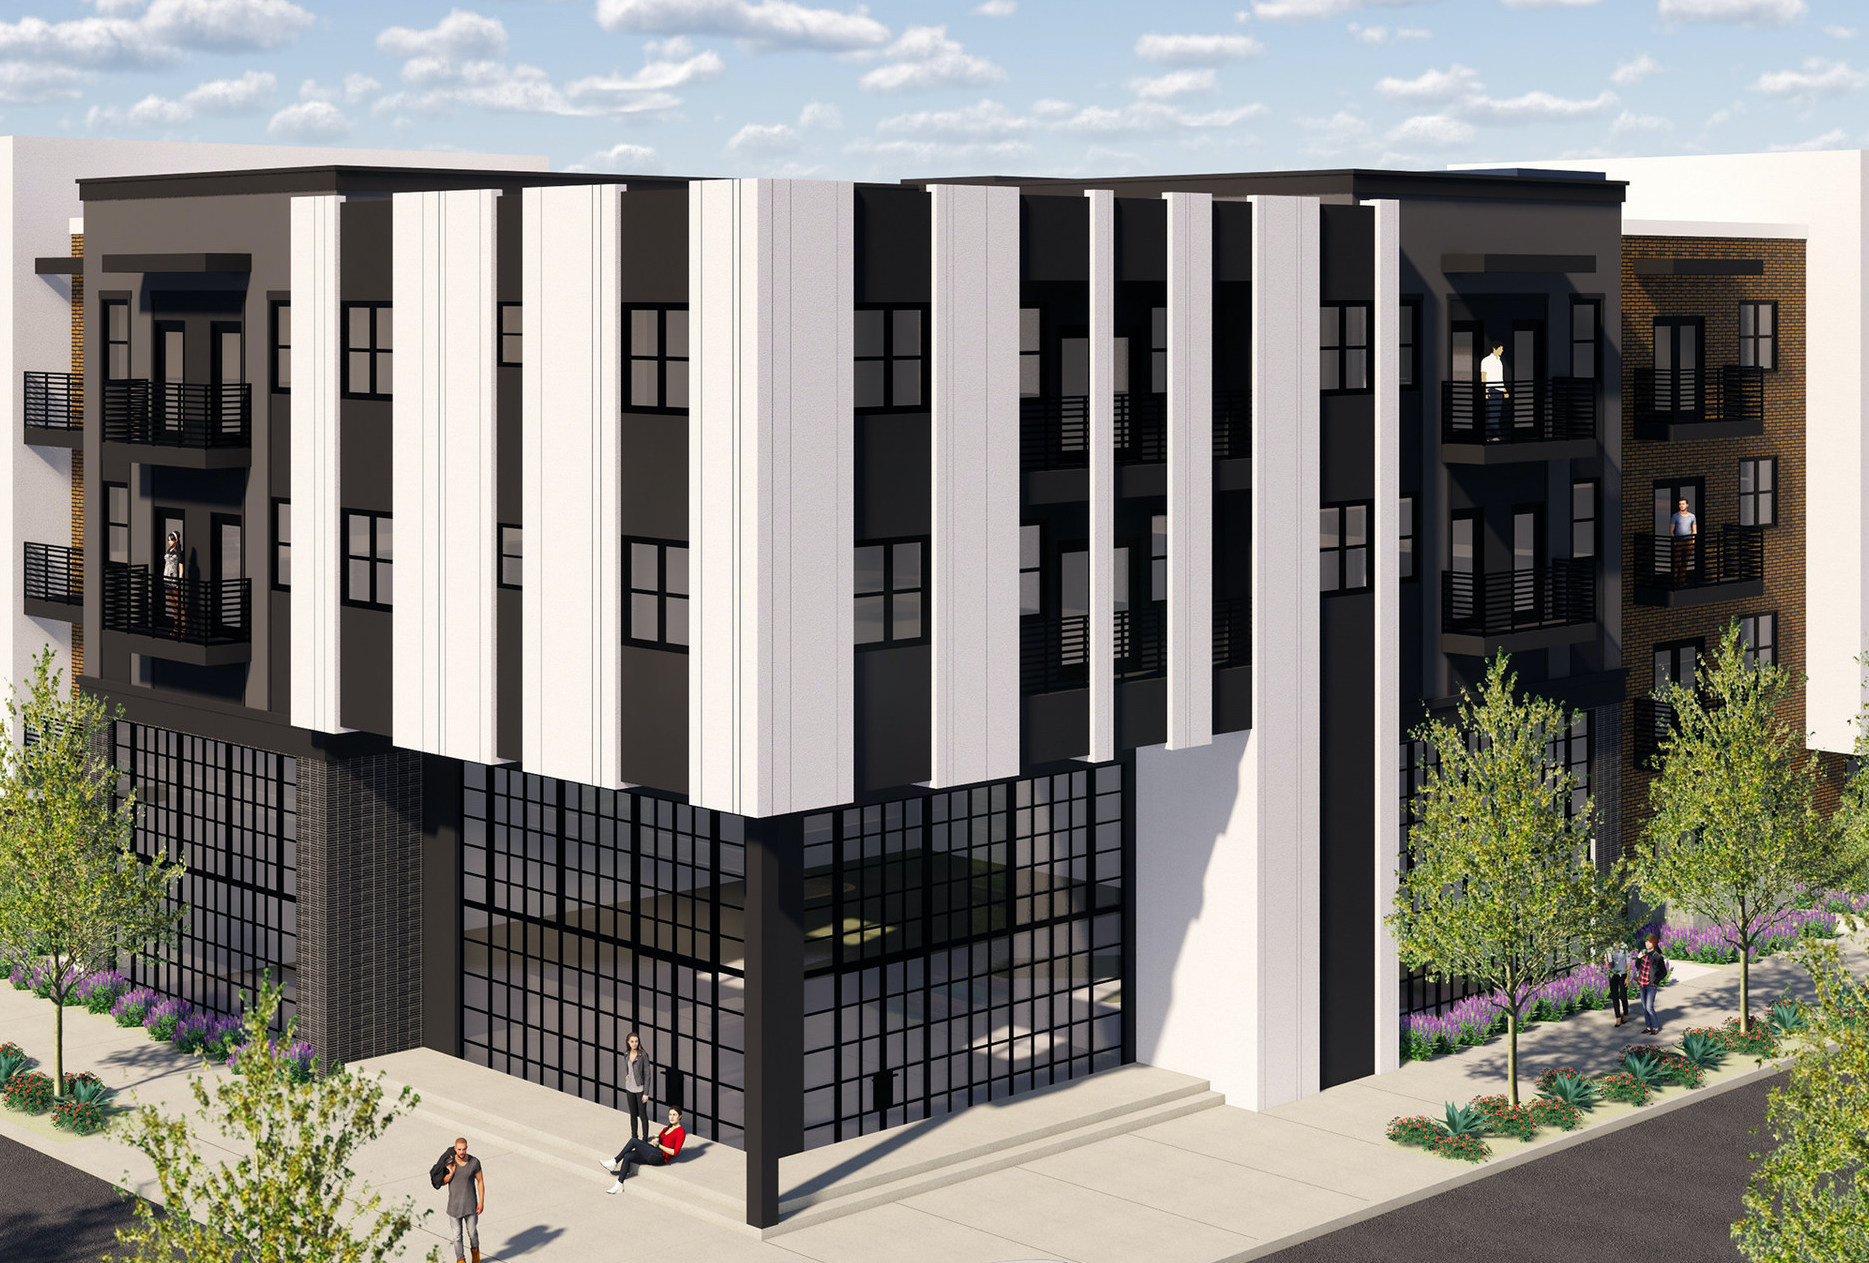 Wood Partners Announces Groundbreaking of 330-Unit Alta Raintree Luxury Residential Community in Scottsdale, Arizona